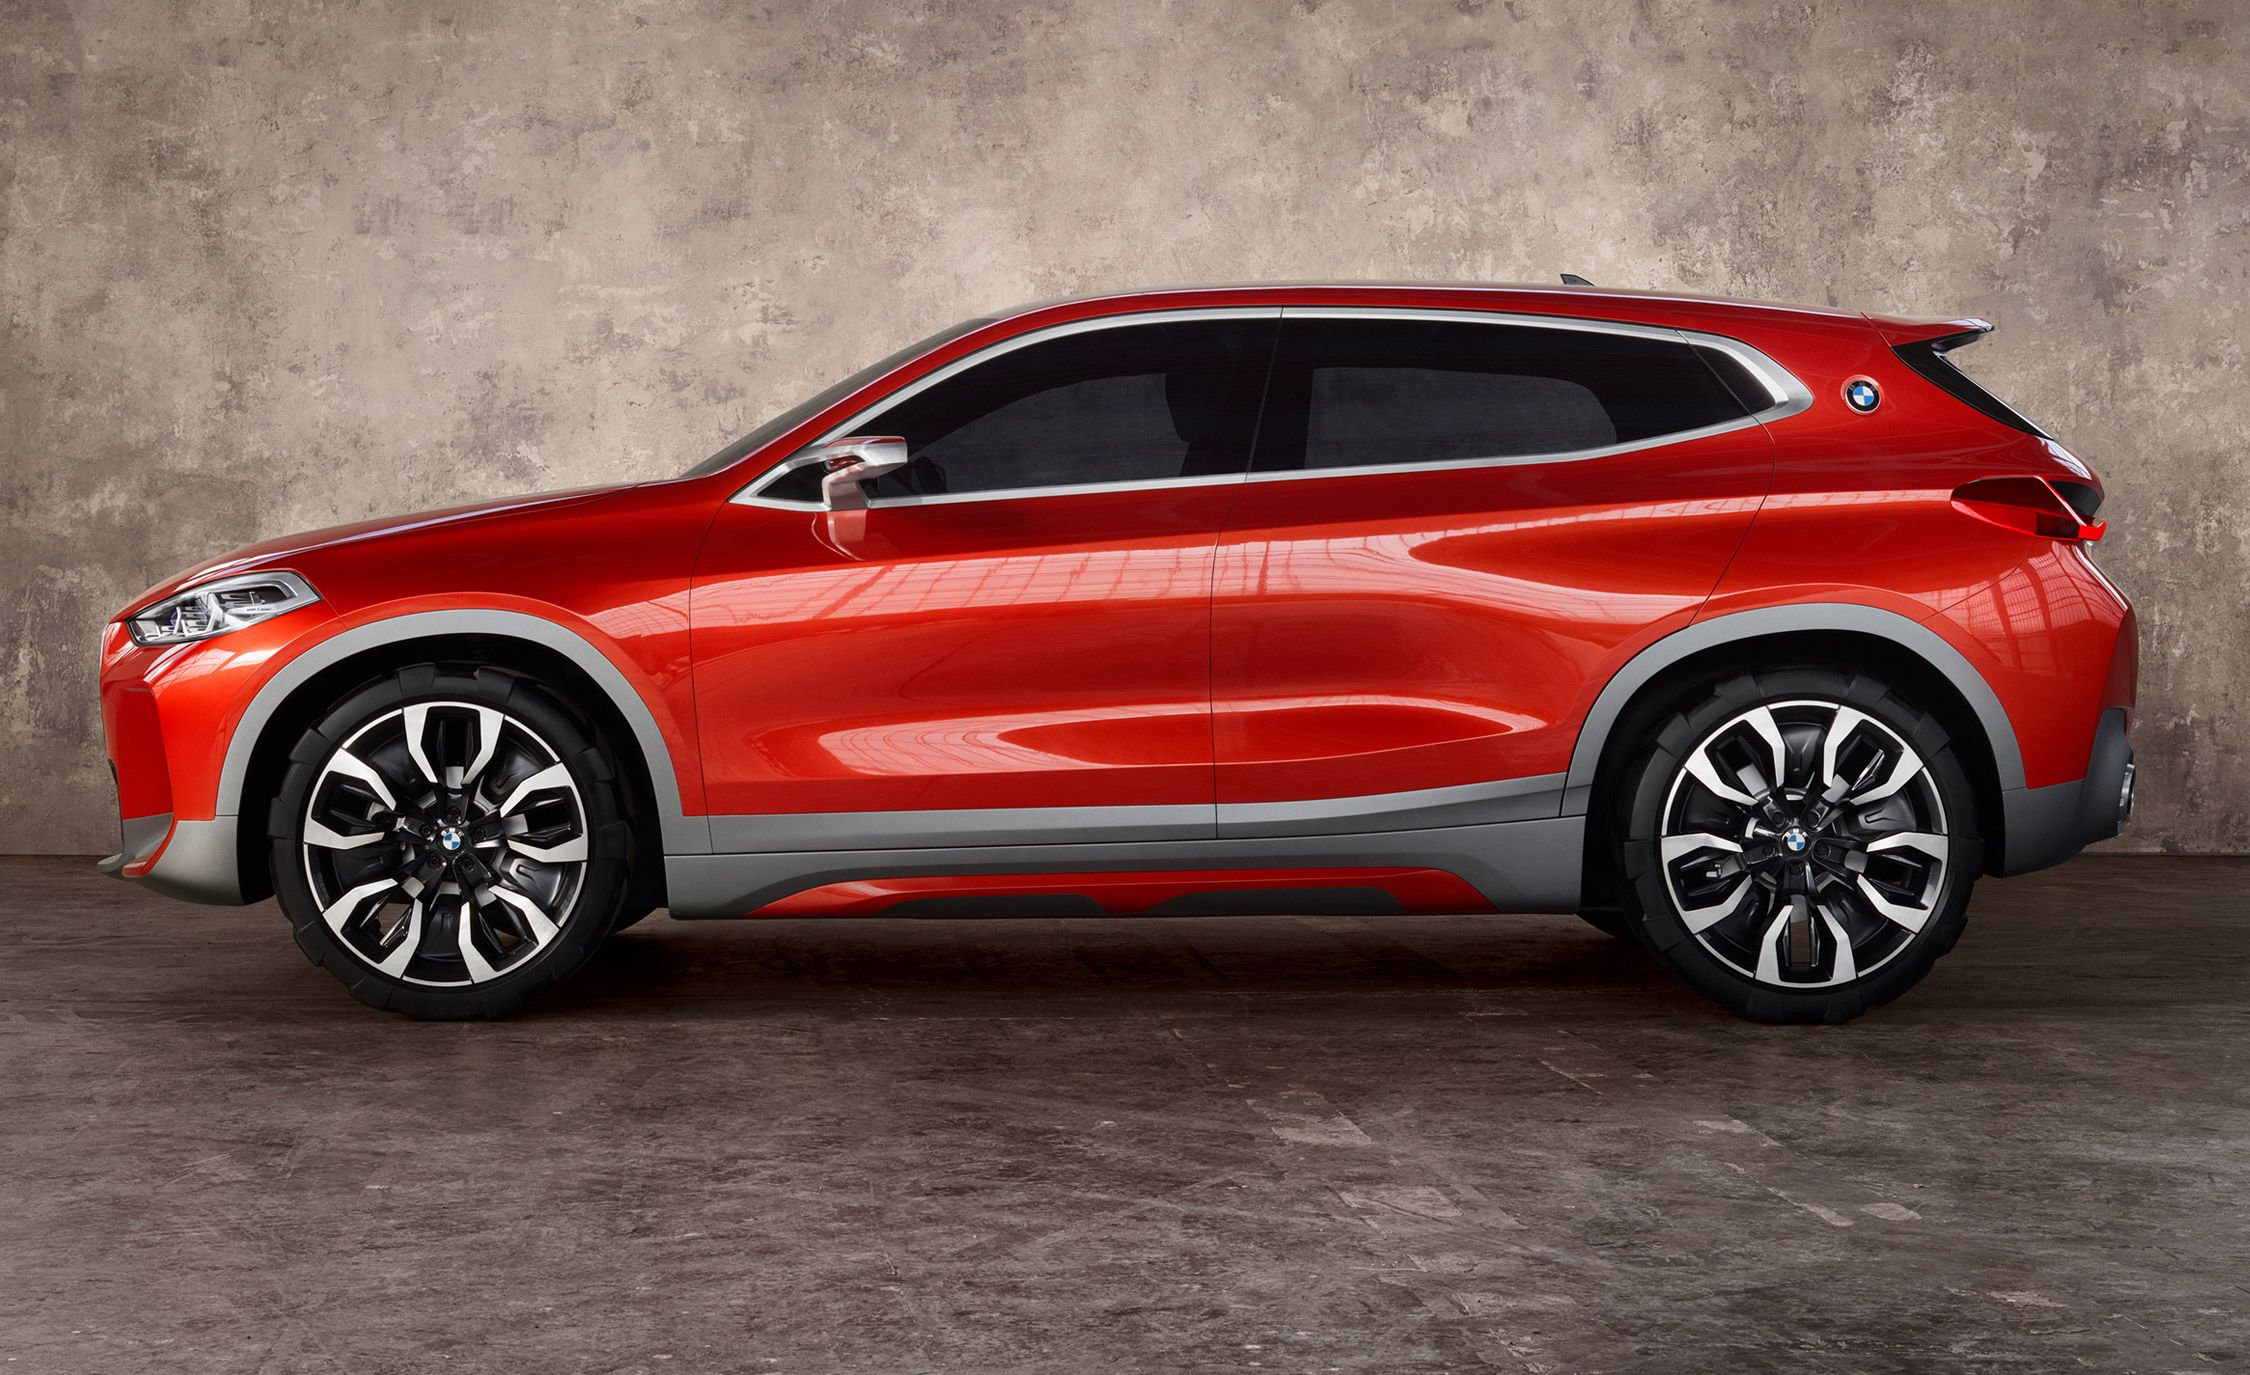 2018 BMW X2: A Sportier, Less Practical X1